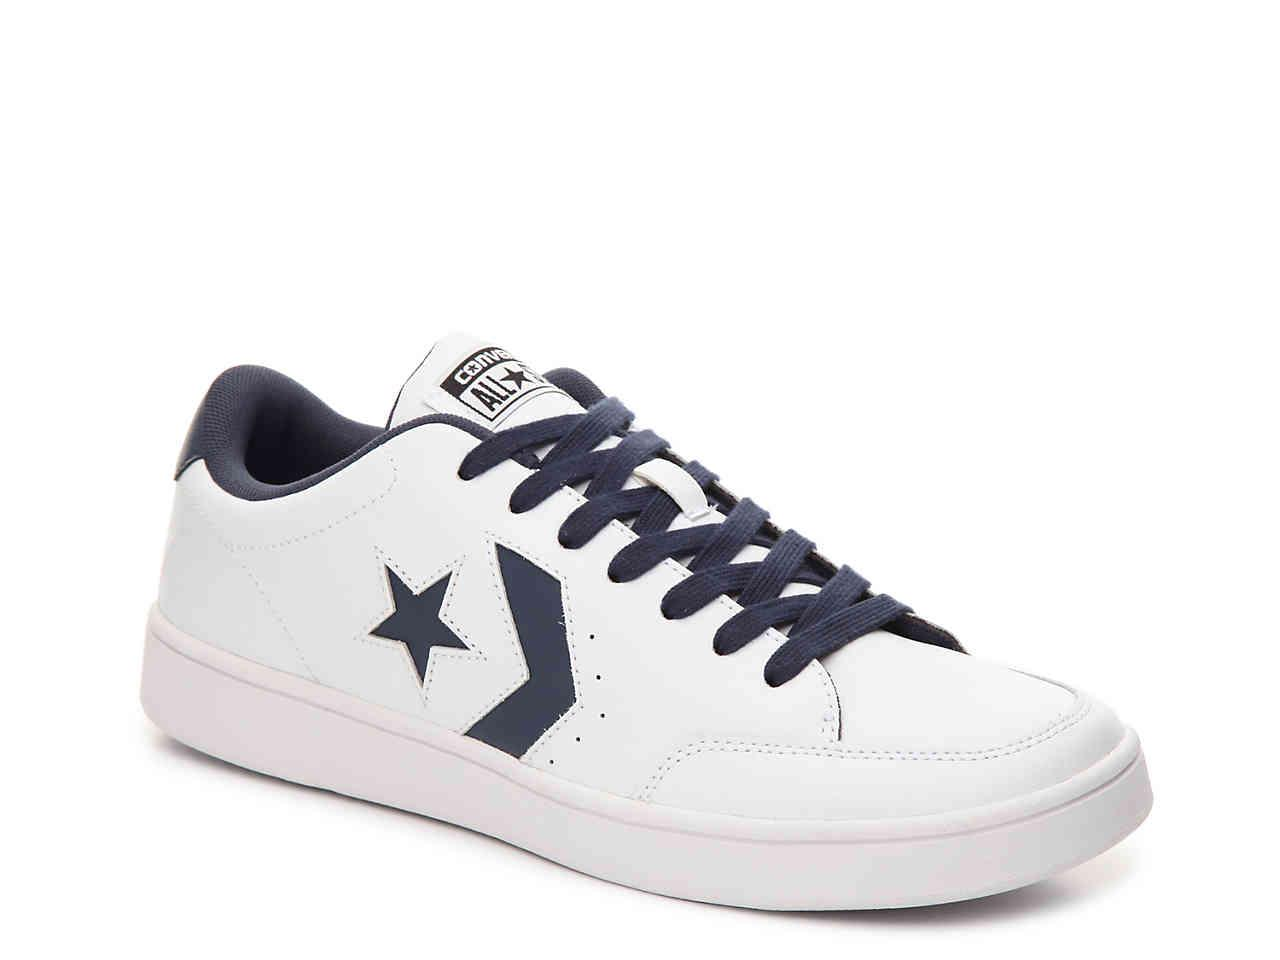 3dda290fcfdd Lyst - Converse Star Court Sneaker in Blue